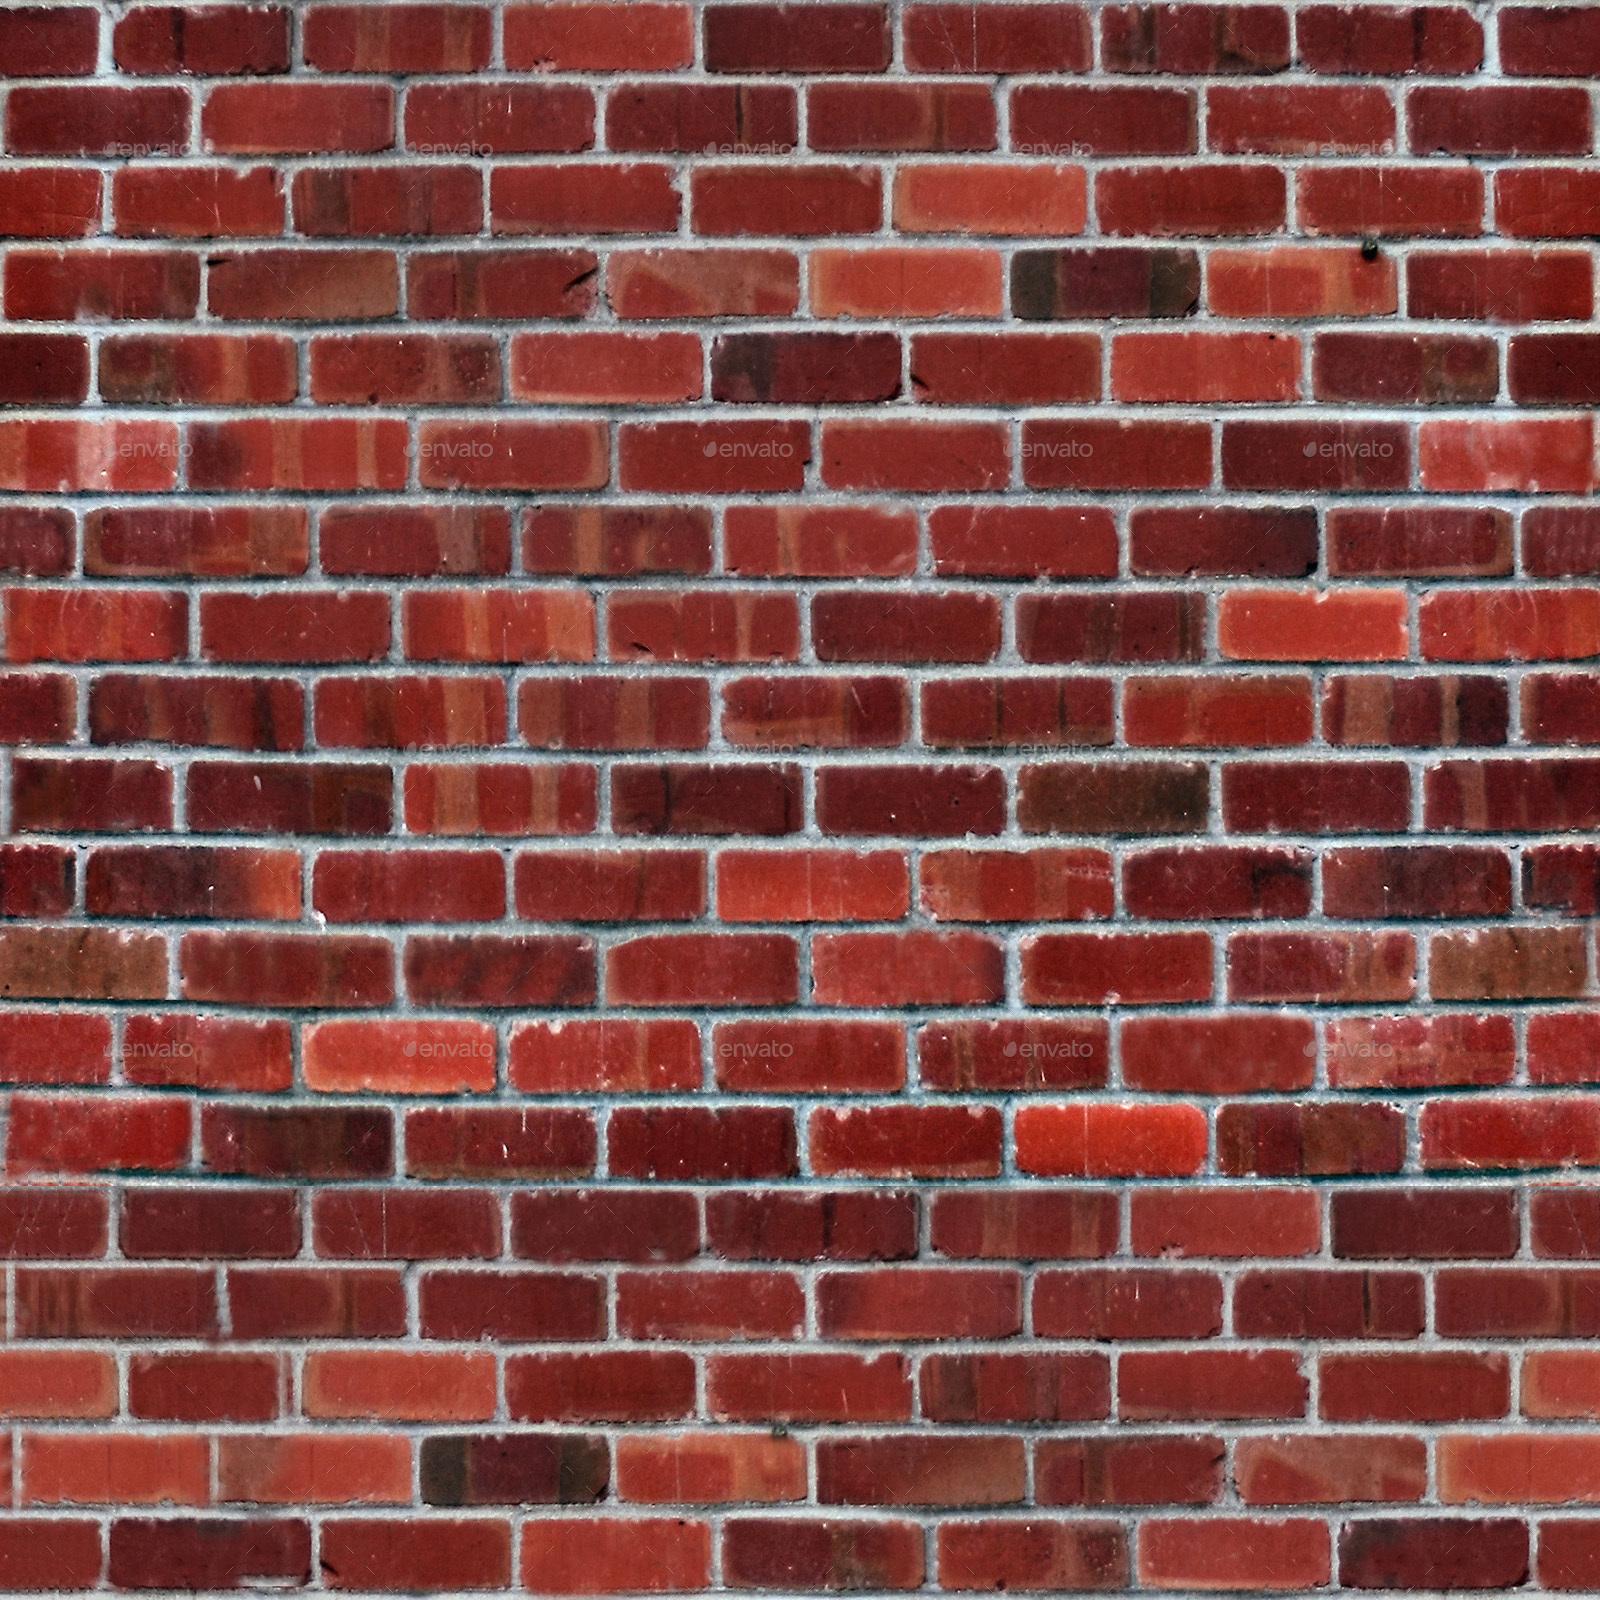 Brick Textures 019 by Quartor   3DOcean